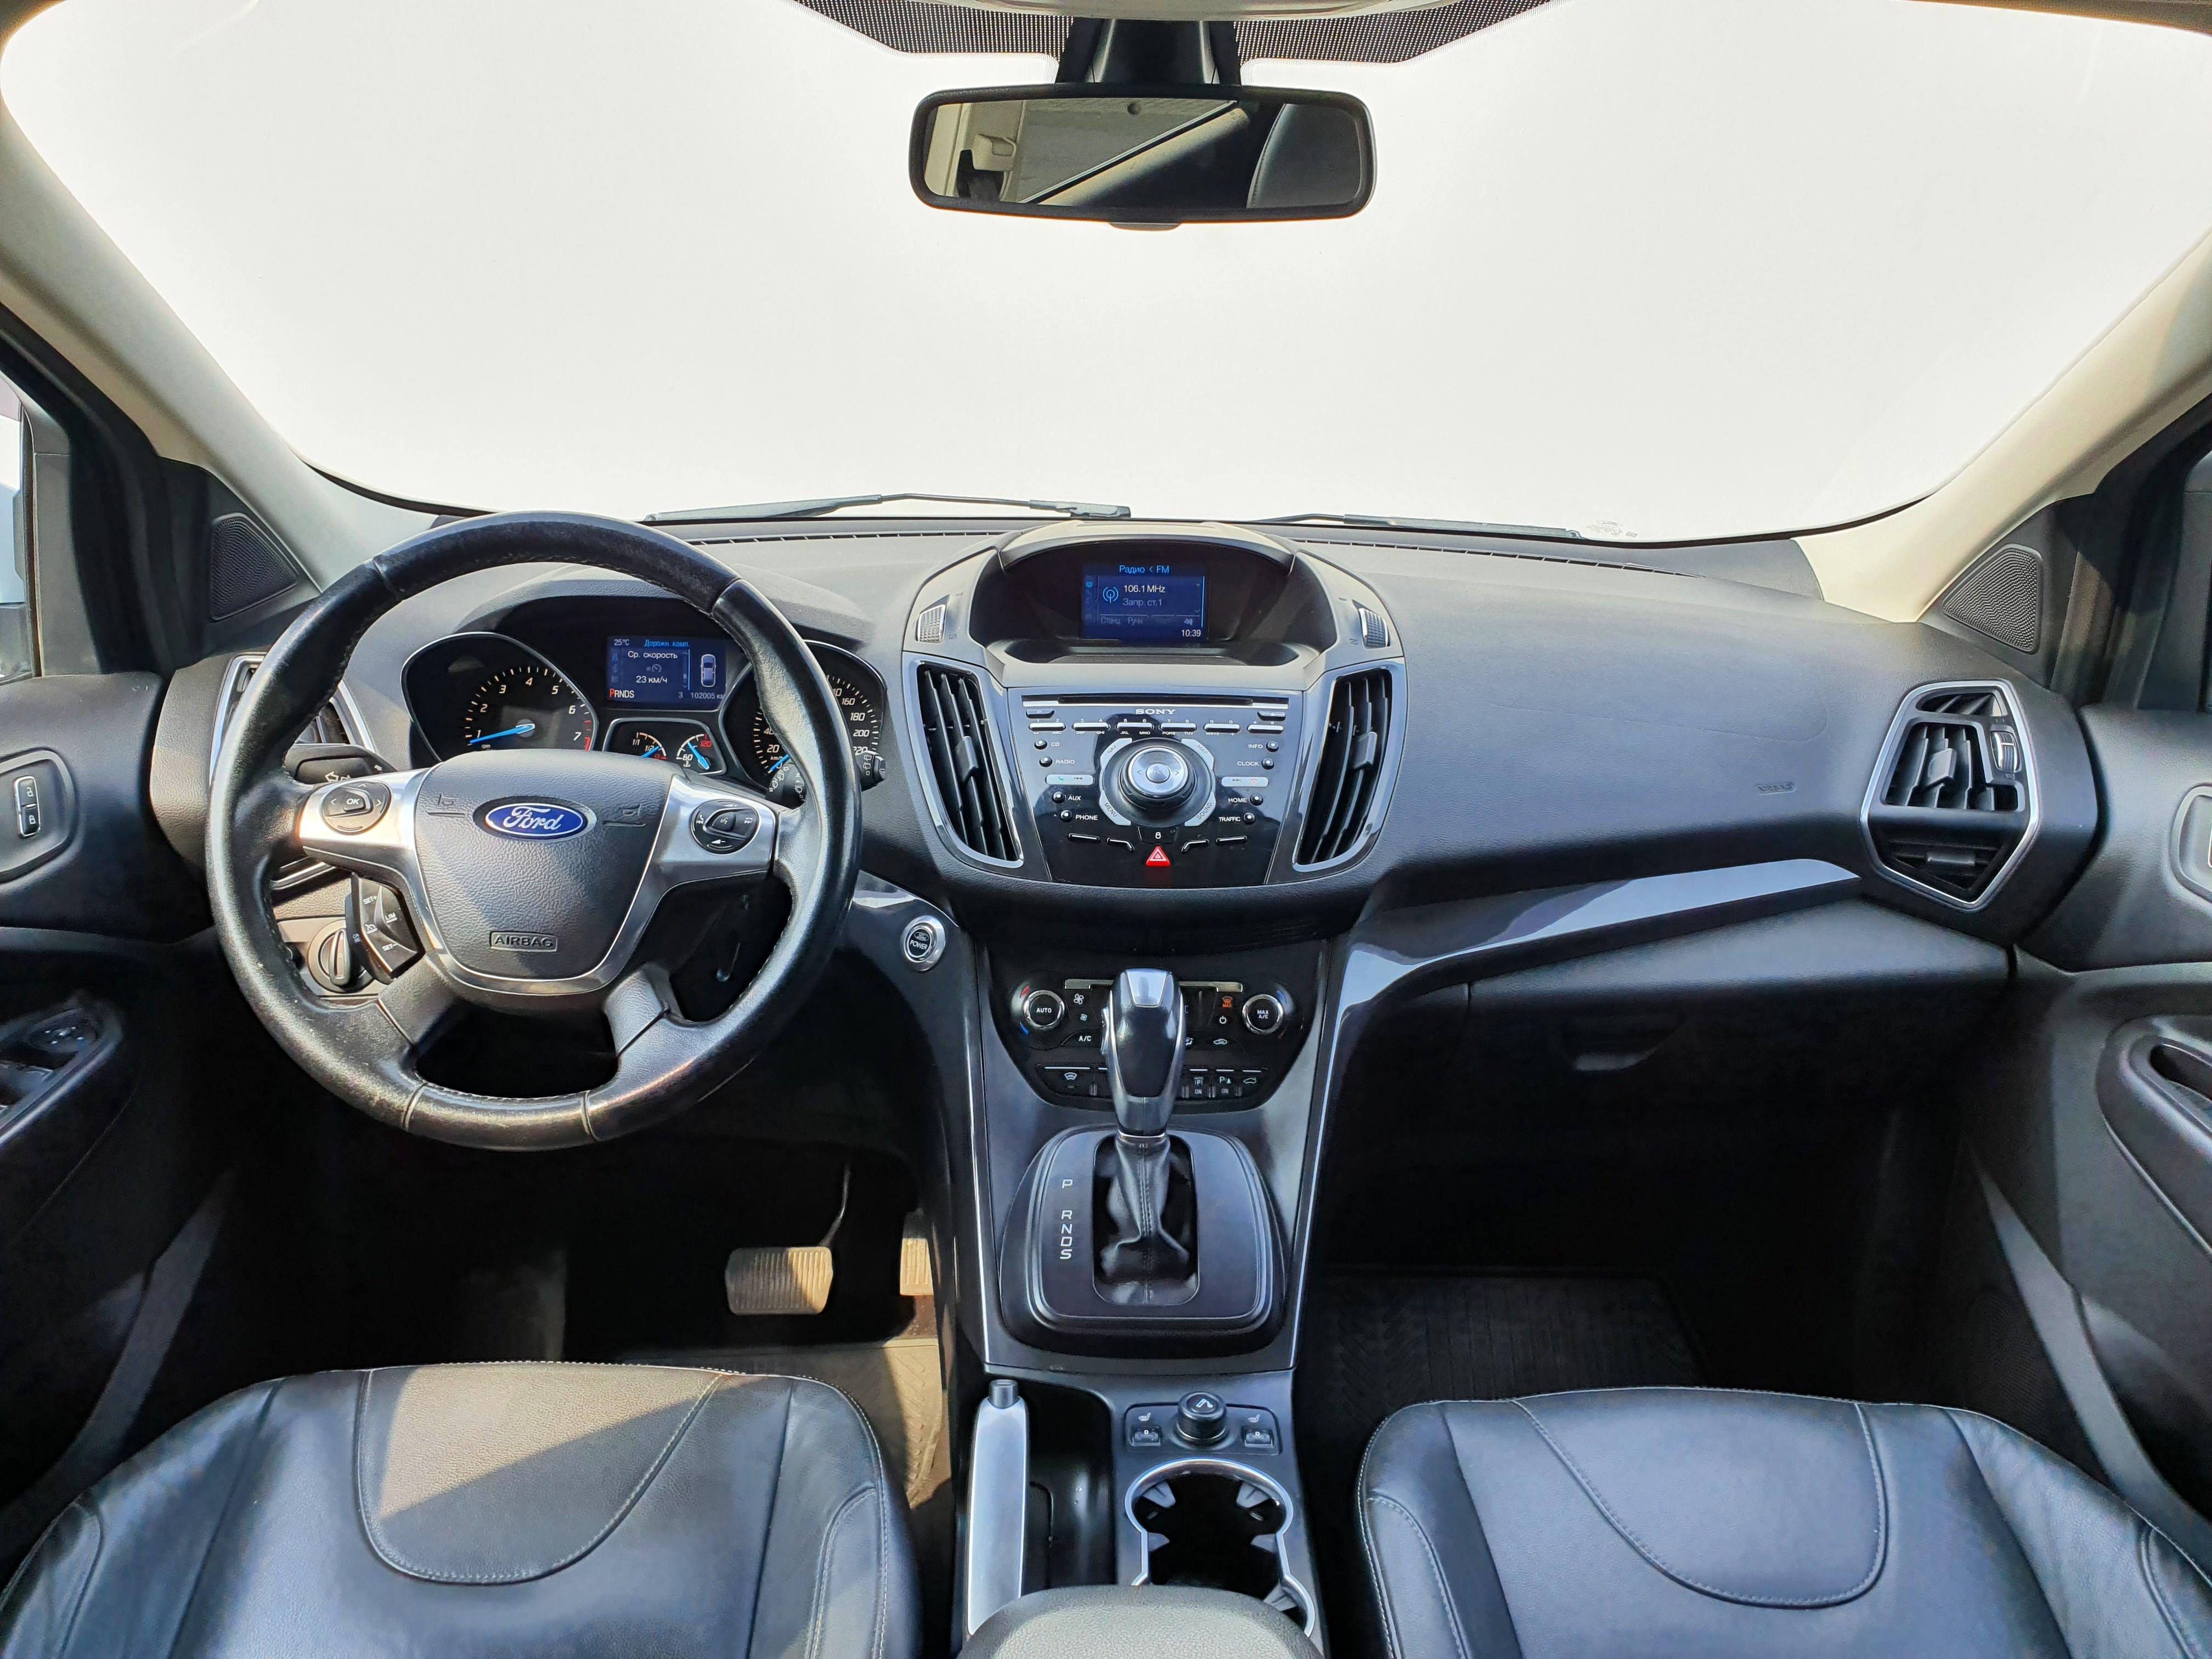 Ford Kuga Внедорожник (2013г.)